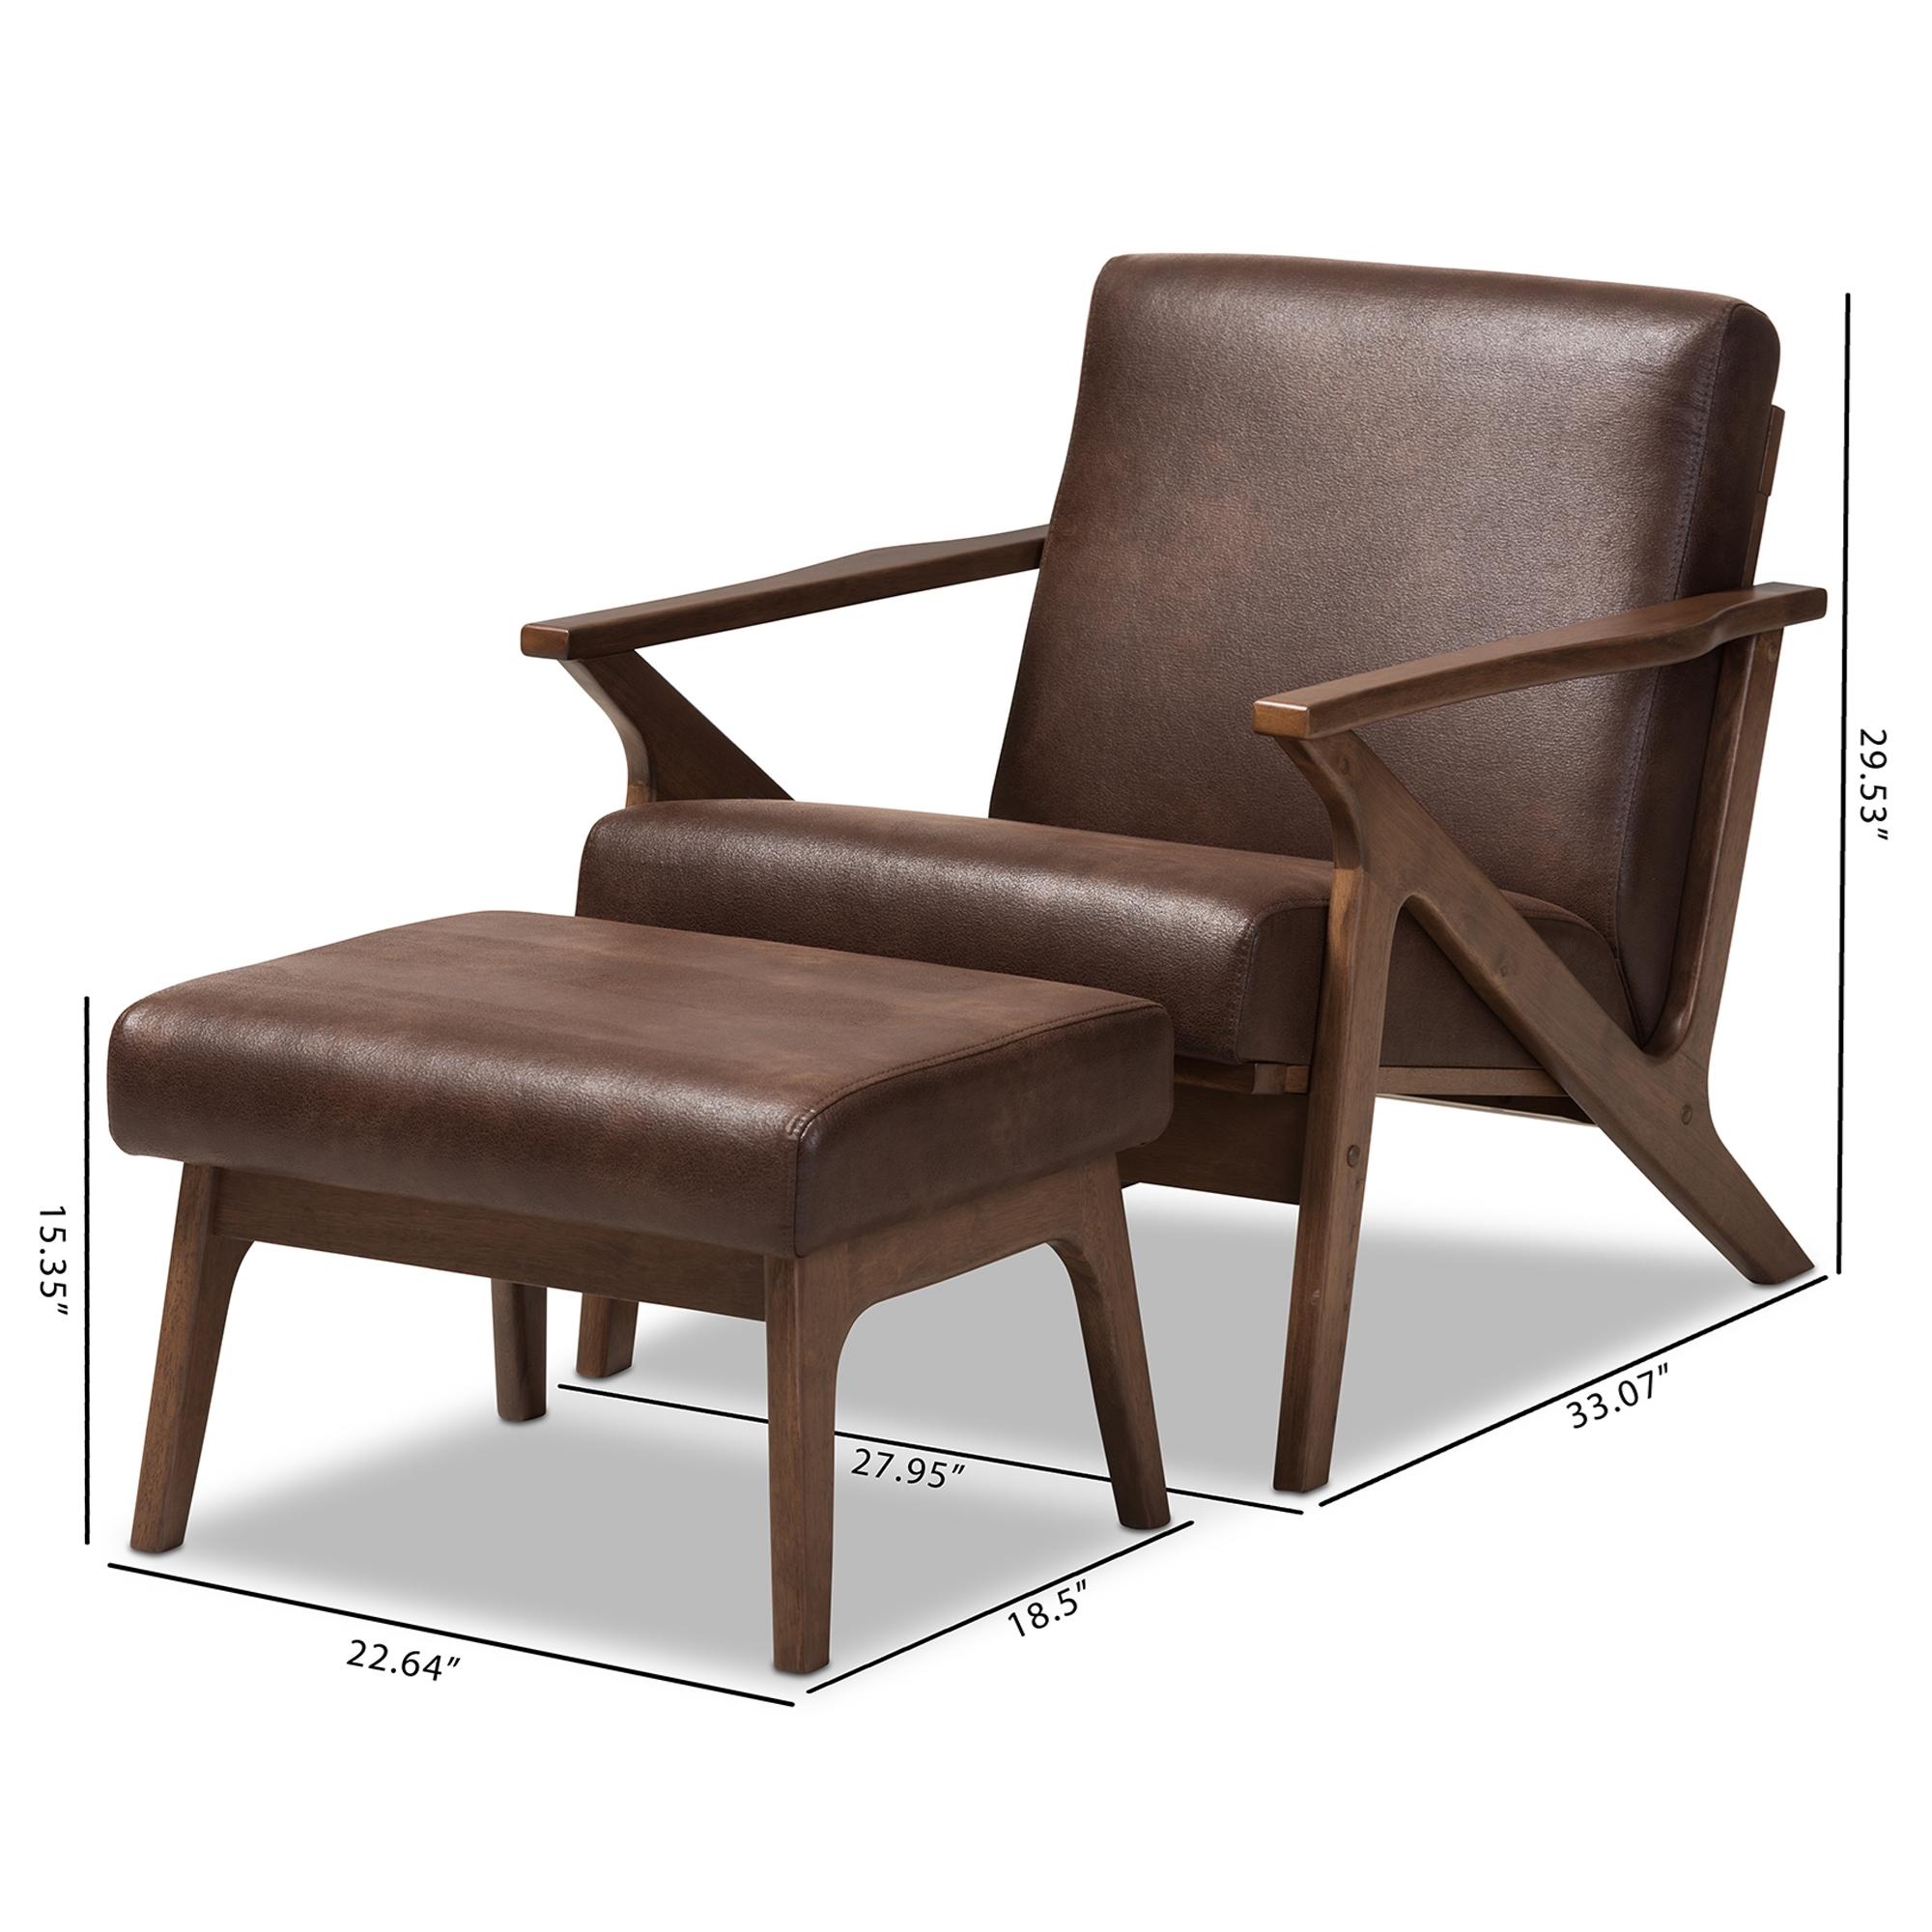 ... Baxton Studio Bianca Mid Century Modern Walnut Wood Dark Brown  Distressed Faux Leather Lounge Chair